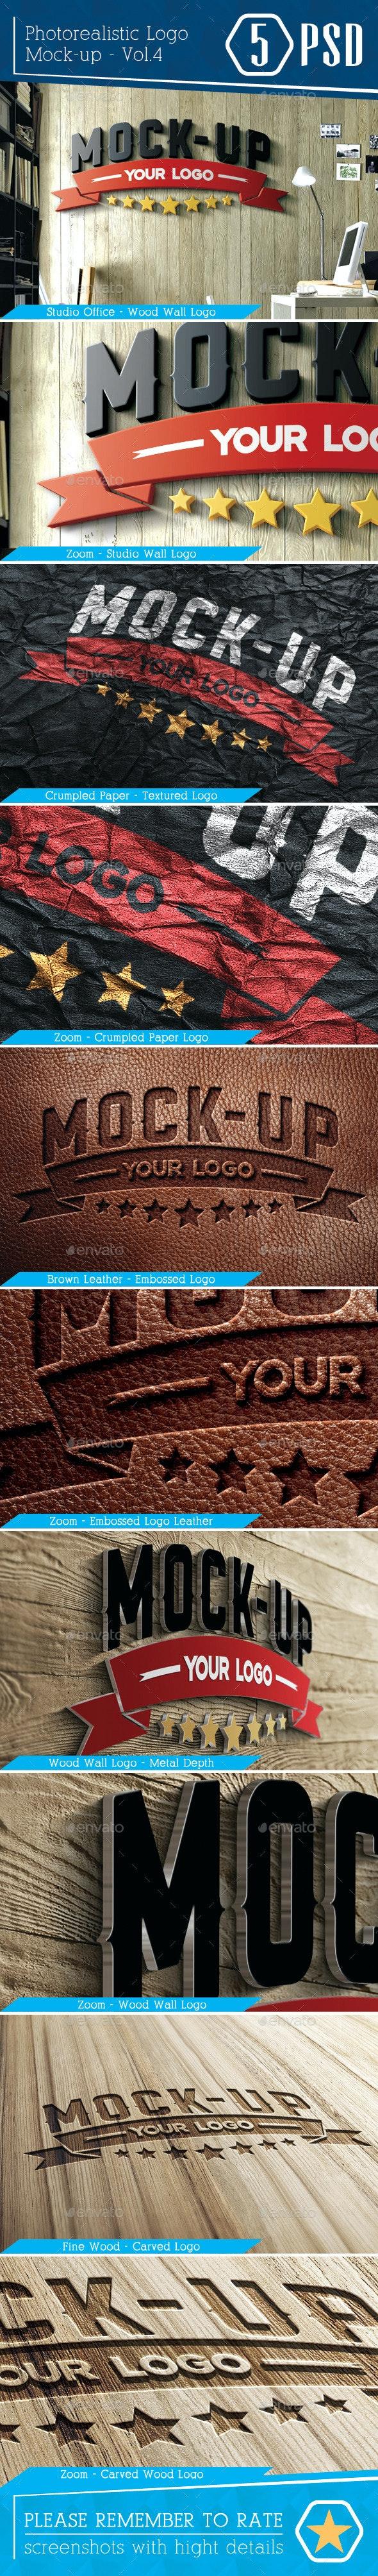 Photorealistic Logo Mock-Up Vol.4 - Logo Product Mock-Ups